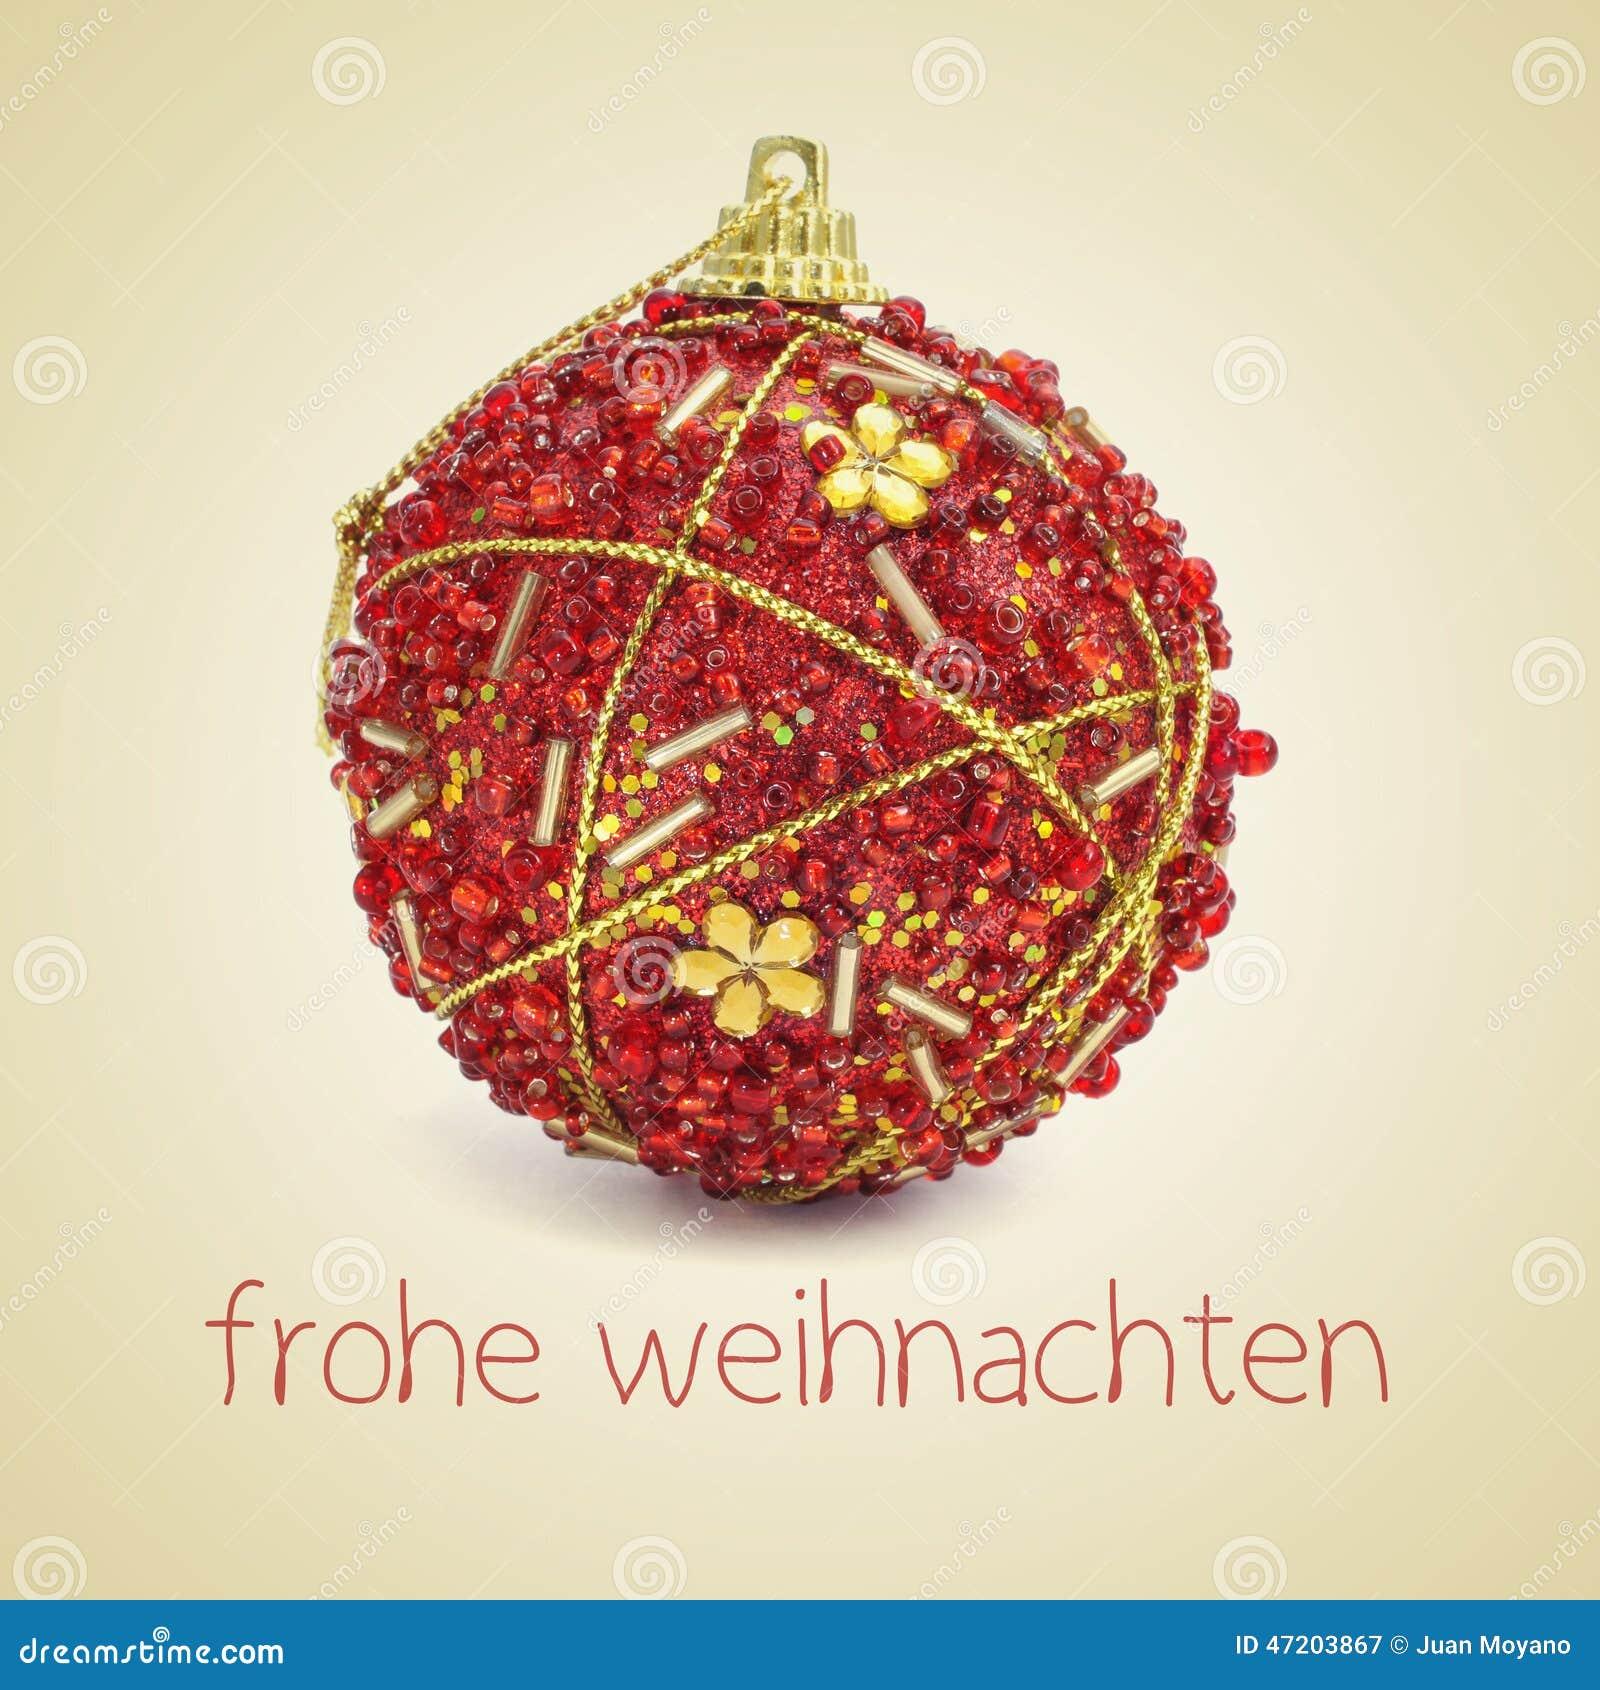 Frasi Di Natale In Tedesco.Frohe Weihnachten Buon Natale In Tedesco Immagine Stock Immagine Di Filtrato Decorazione 47203867